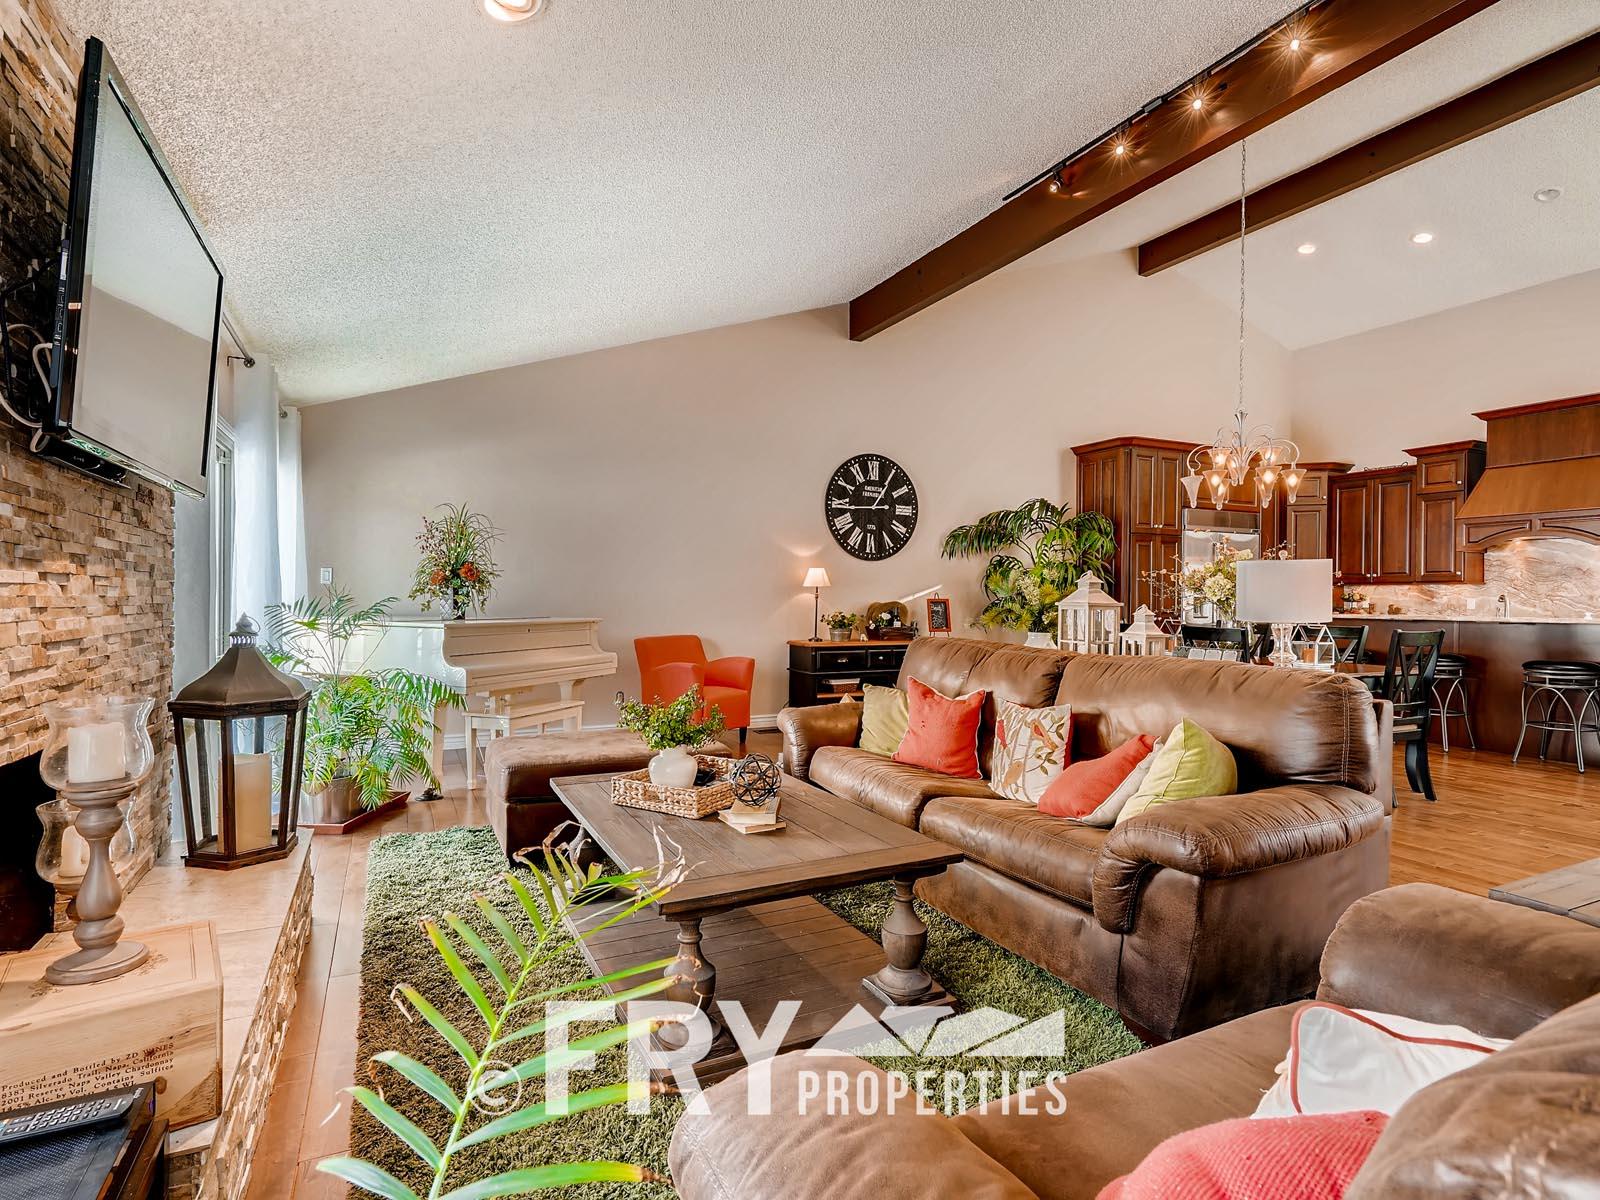 6305 W 6th Ave Unit A6-print-004-25-Living Room-3600x2400-300dpi